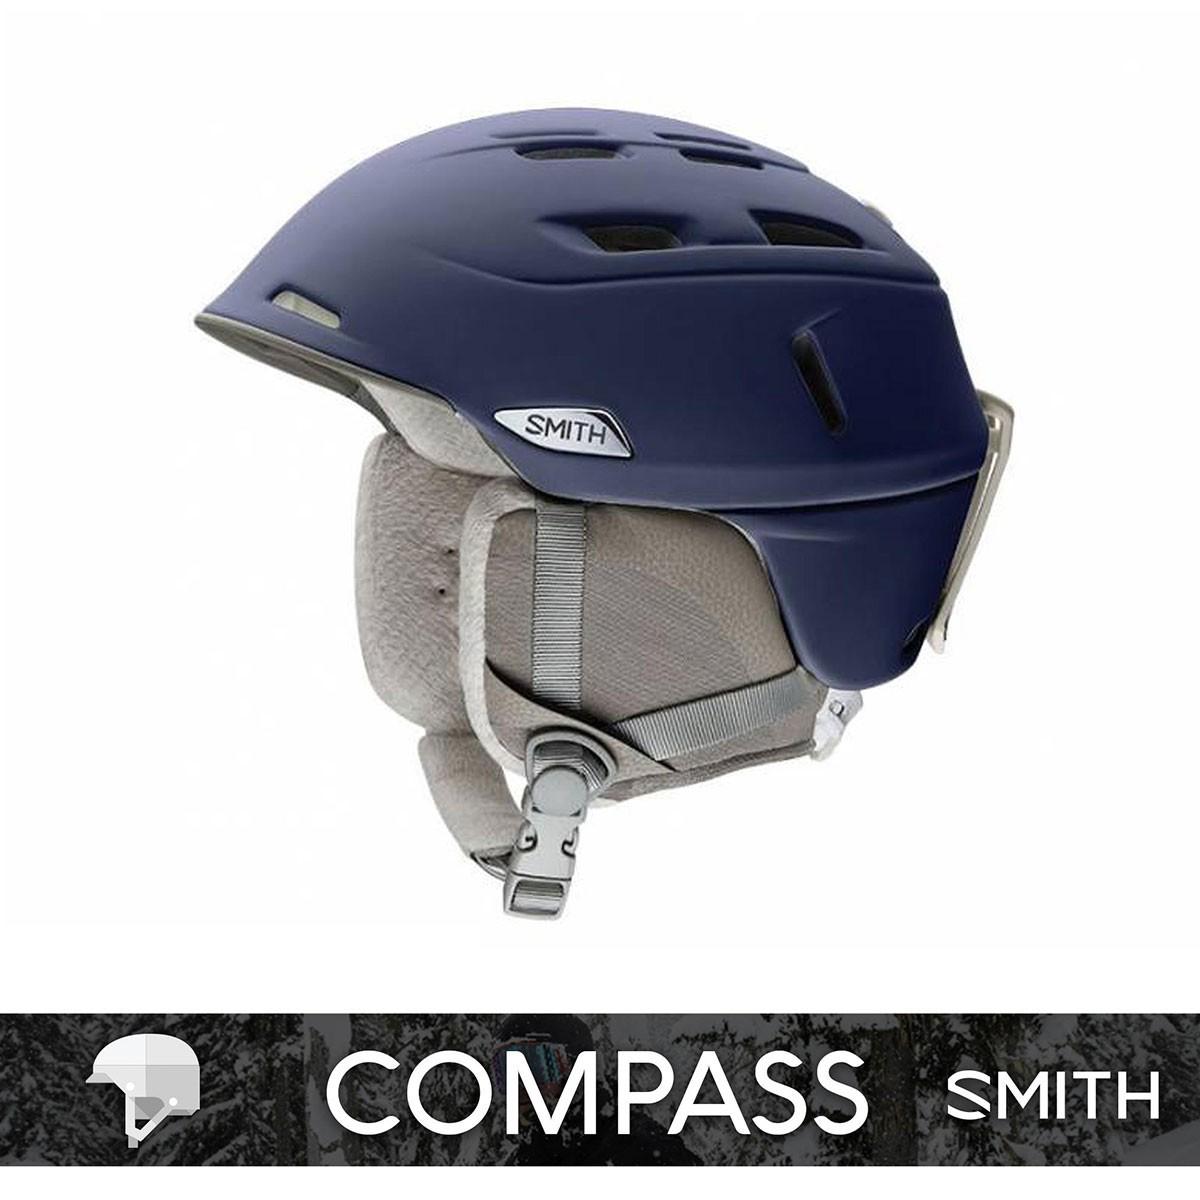 SMITH COMPASS matte Midnight - Изображение - AQUAMATRIX